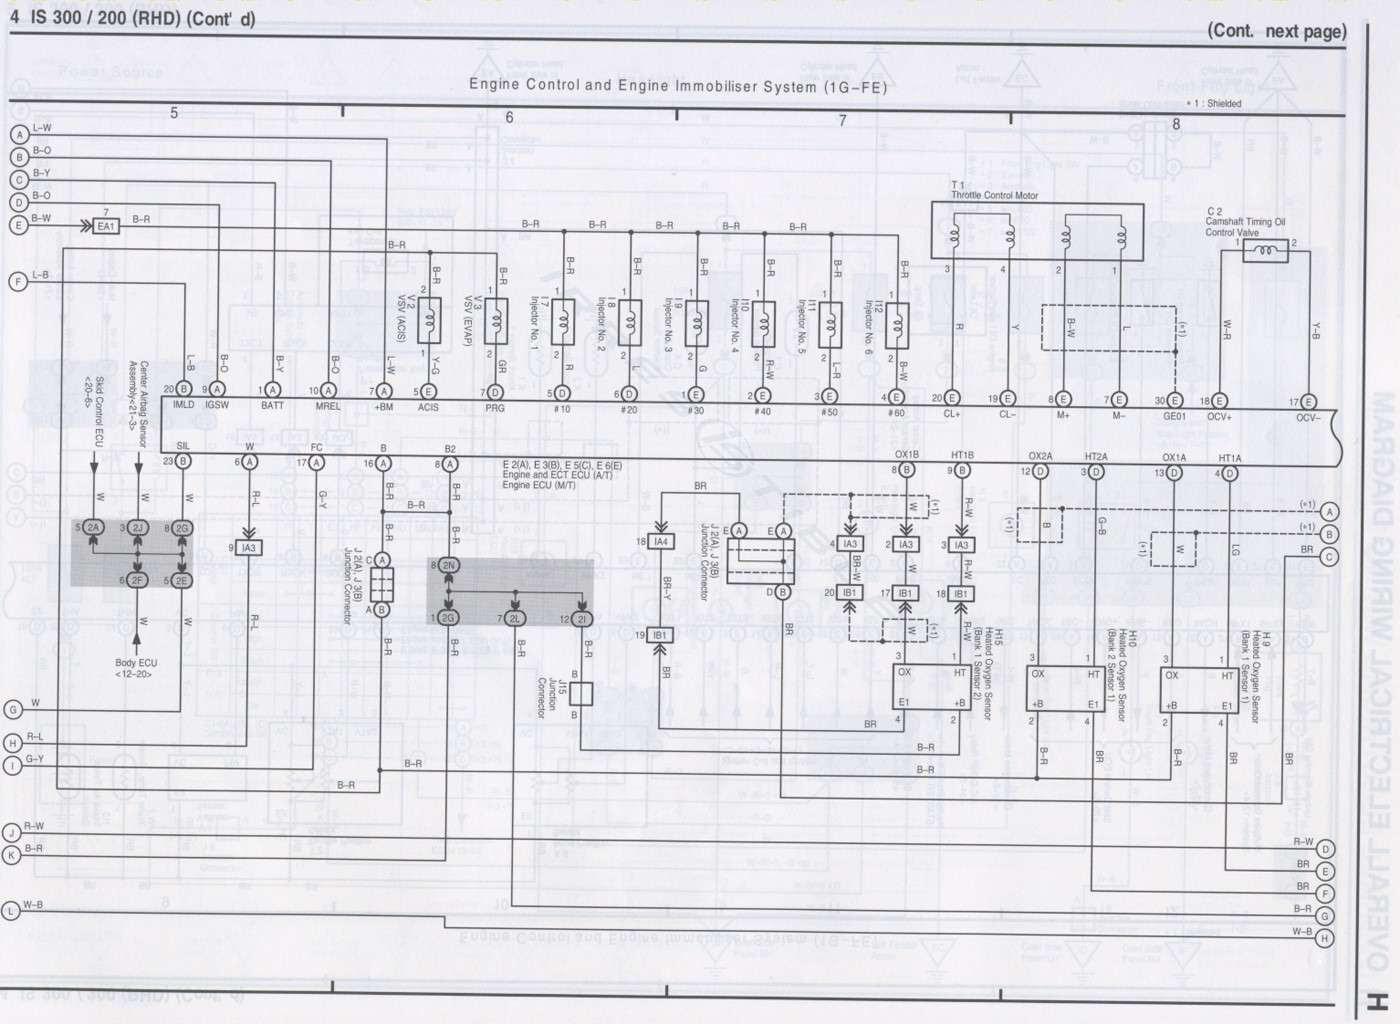 Schema 2nz Fe Ecu Wiring Diagram Full Hd Freshvegetable Msc Lausitzring De